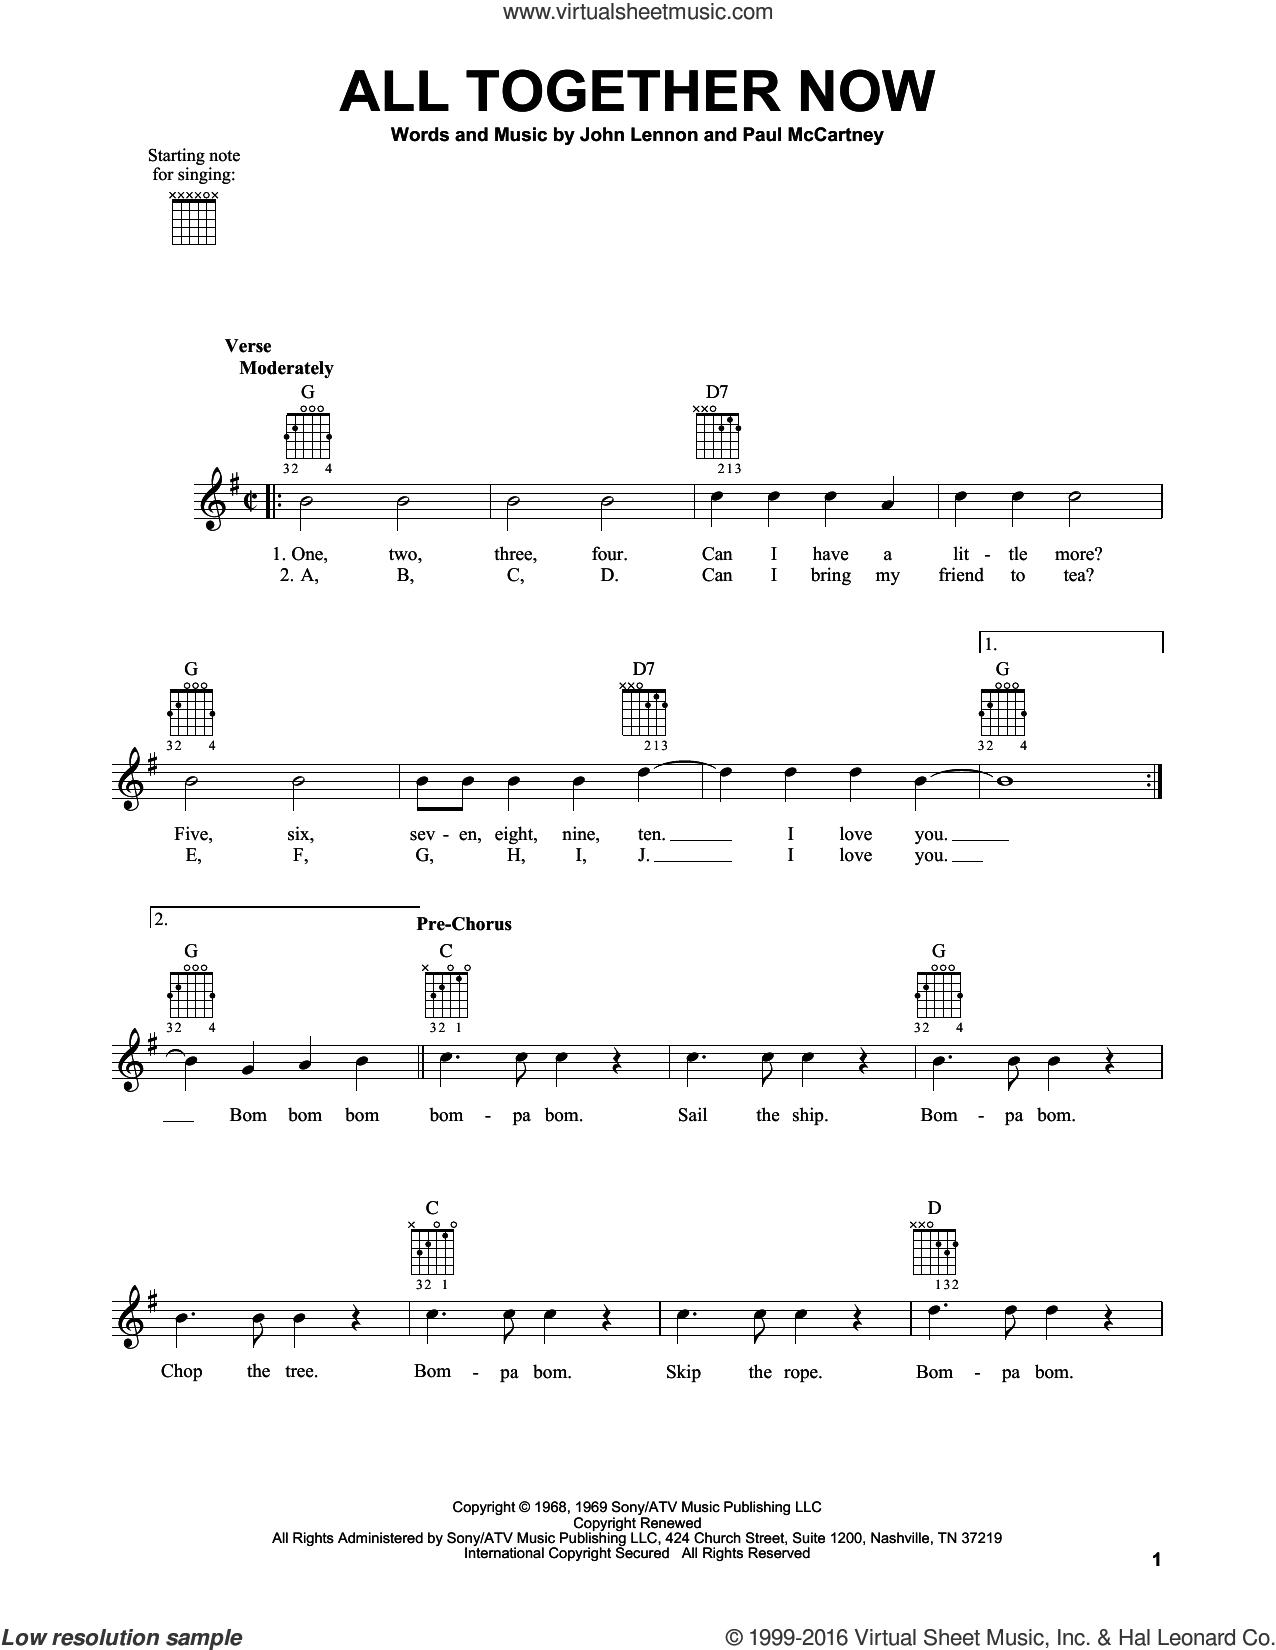 Pin By Virtual Sheet Music On The Beatles Sheet Music Pinterest